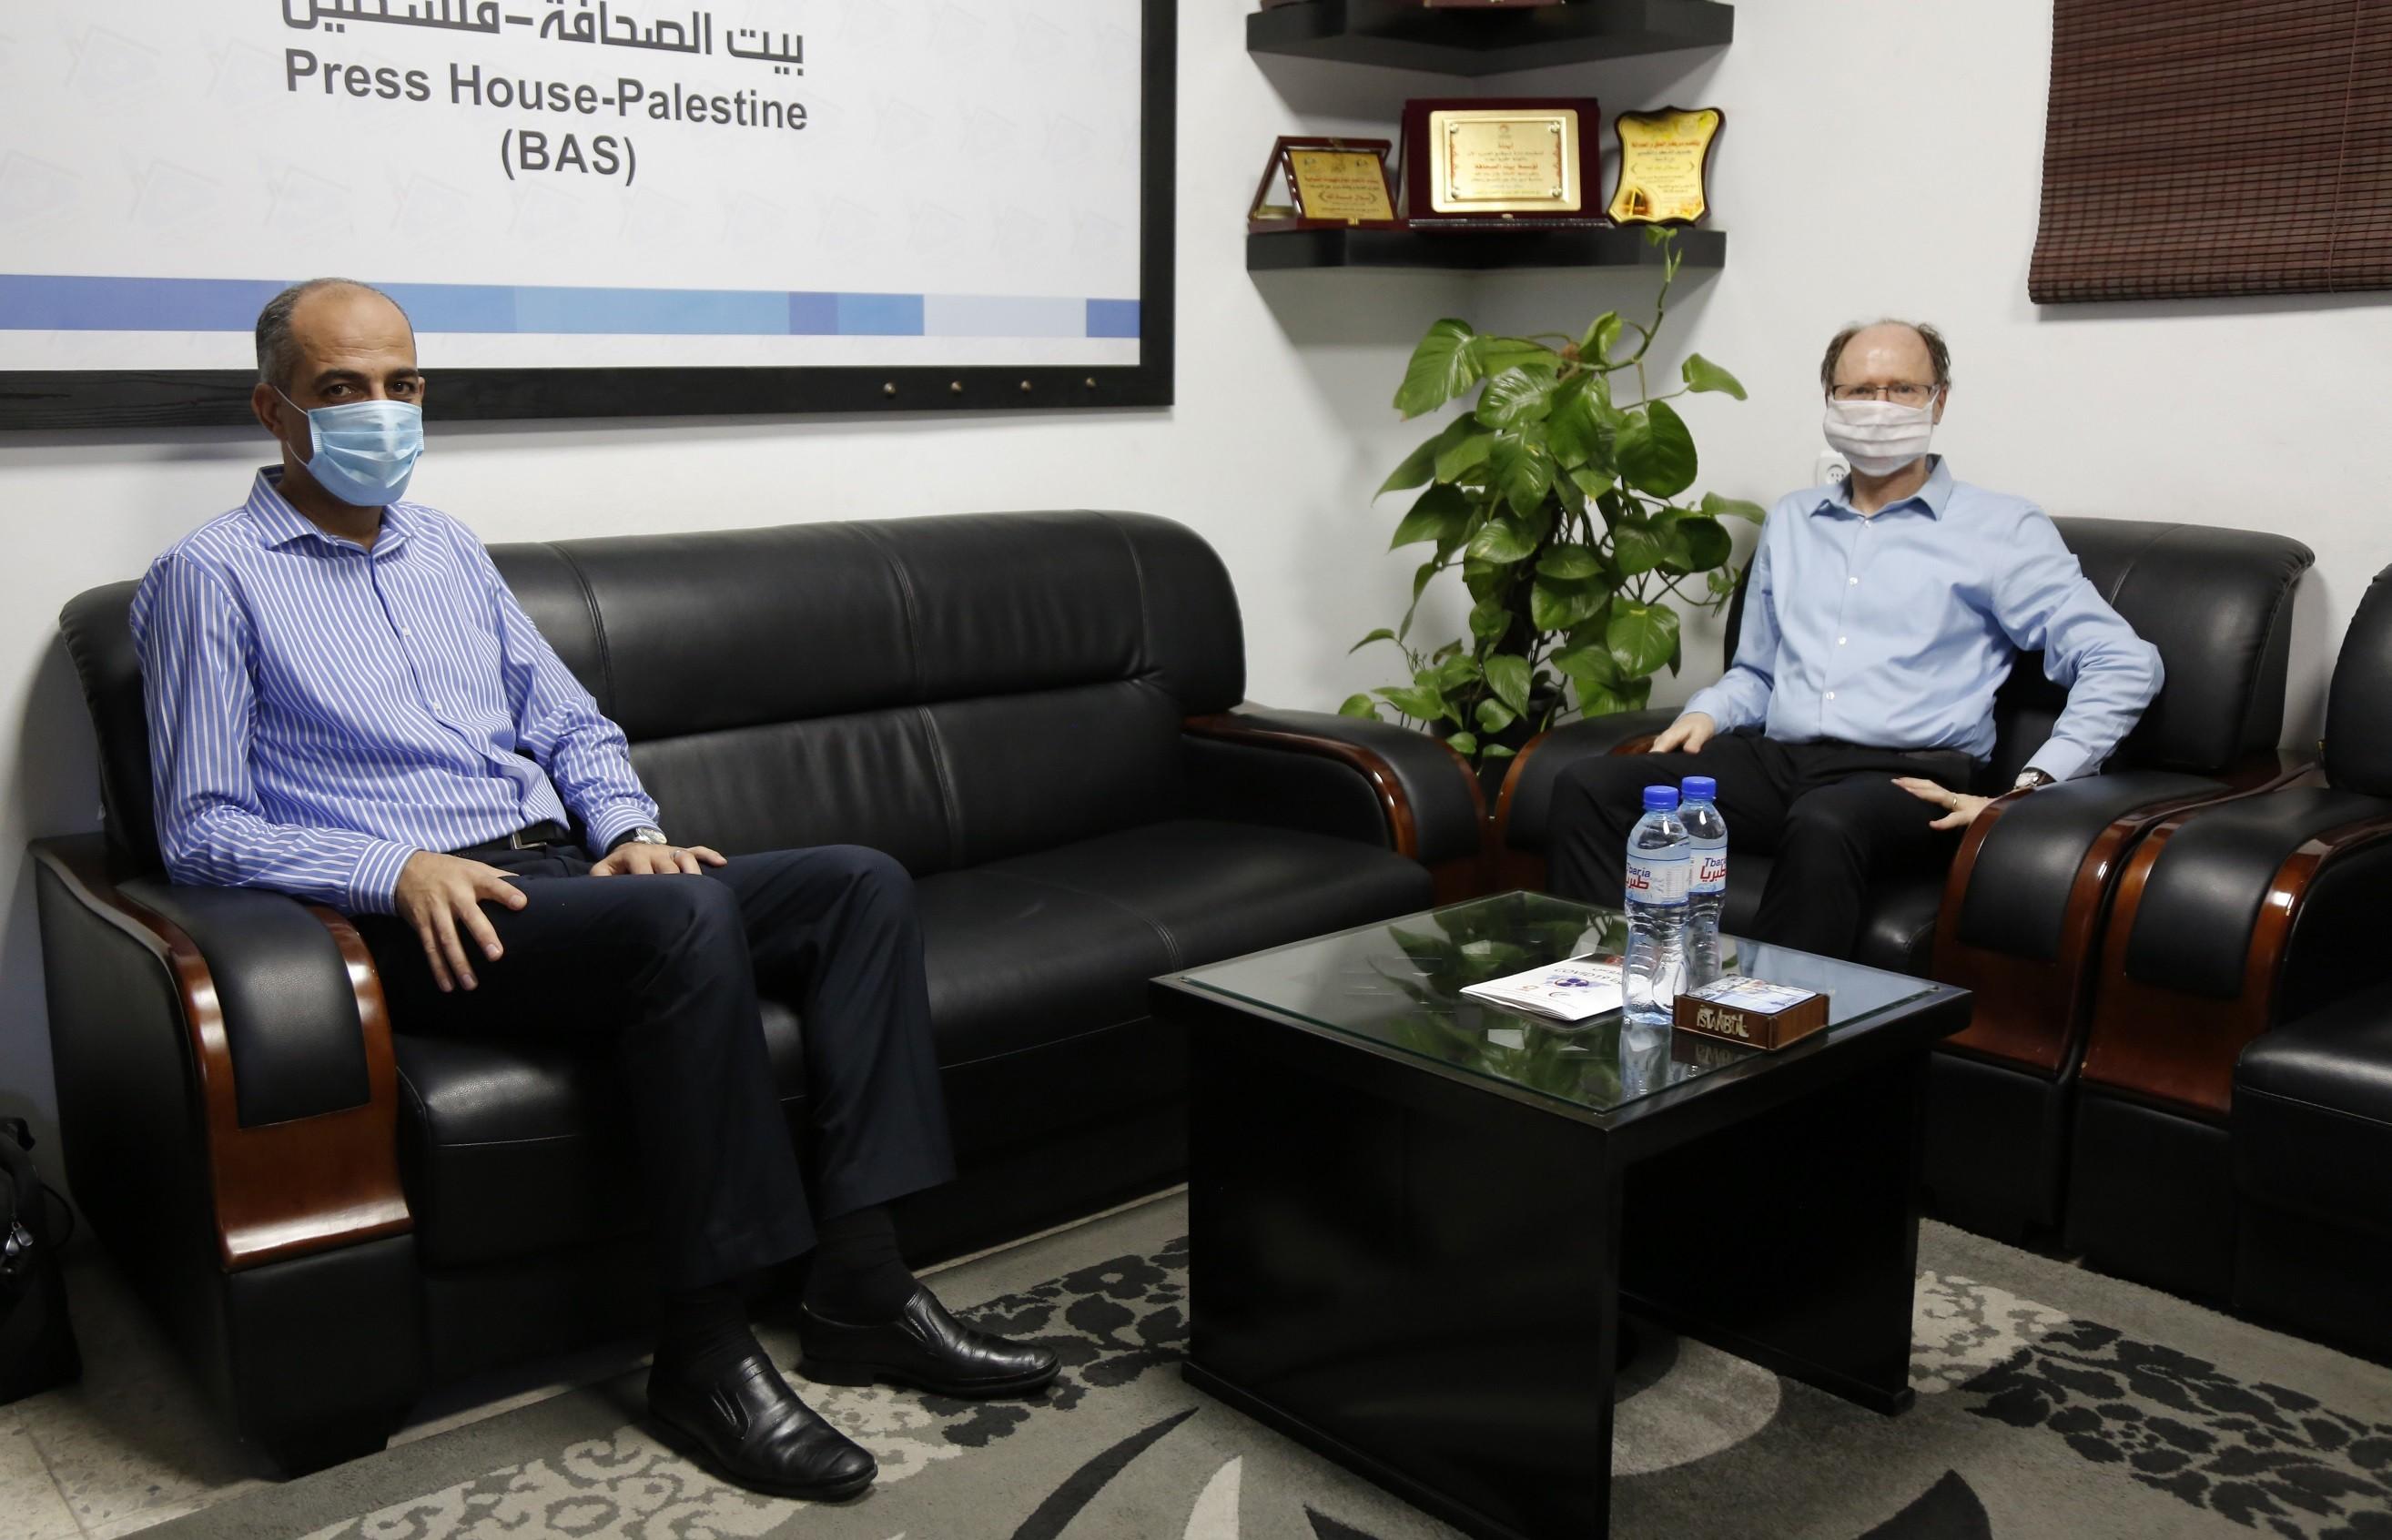 UNESCO's Gaza Office Director Visits Press House – Palestine